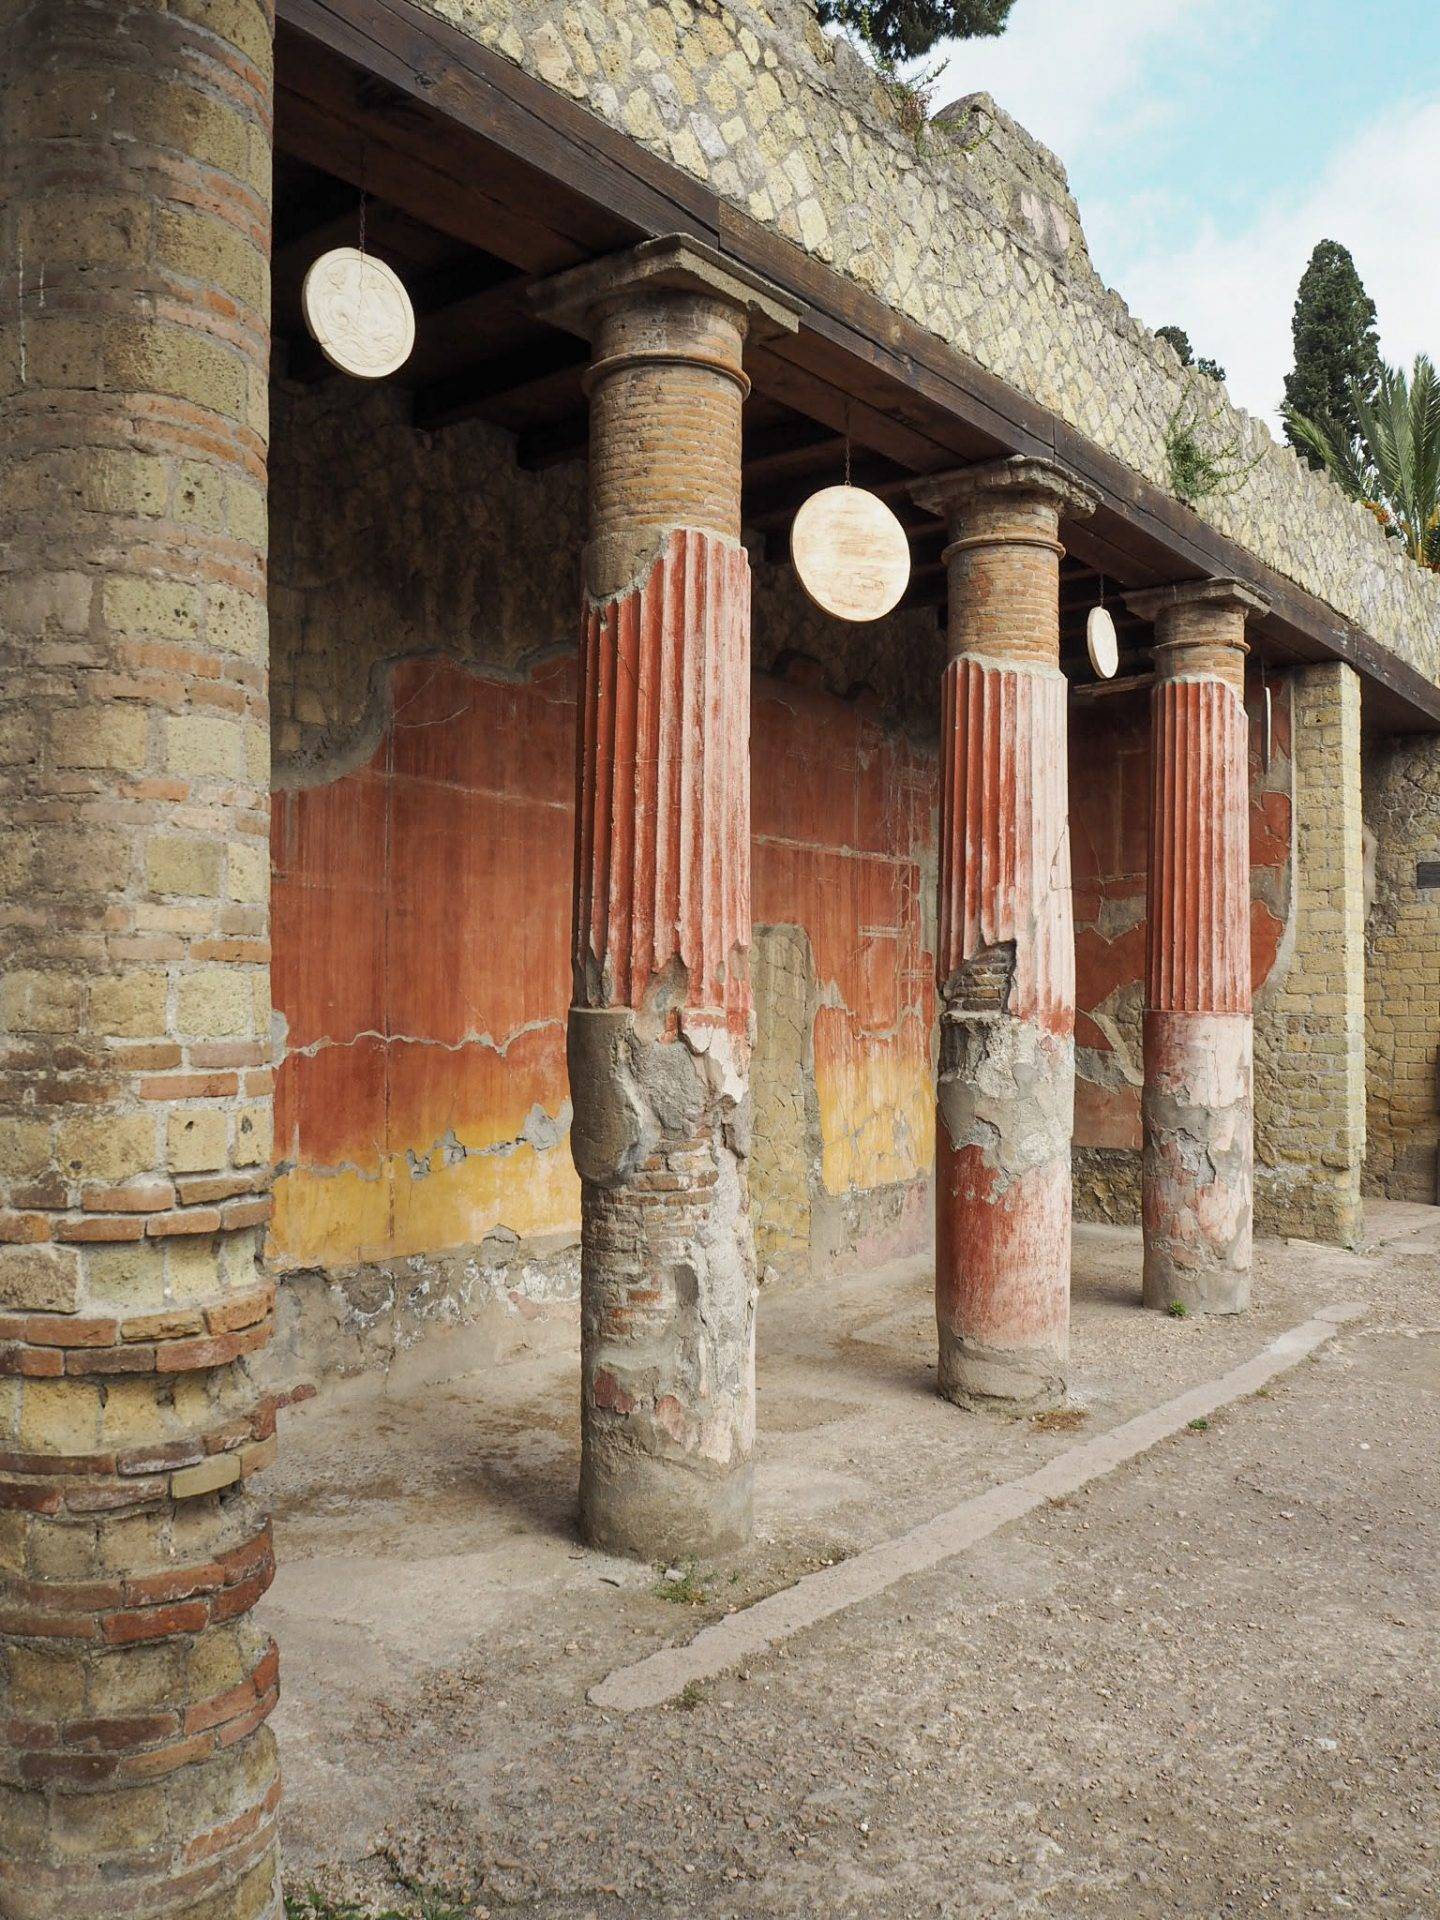 Sorrento travel - Colourful ruins